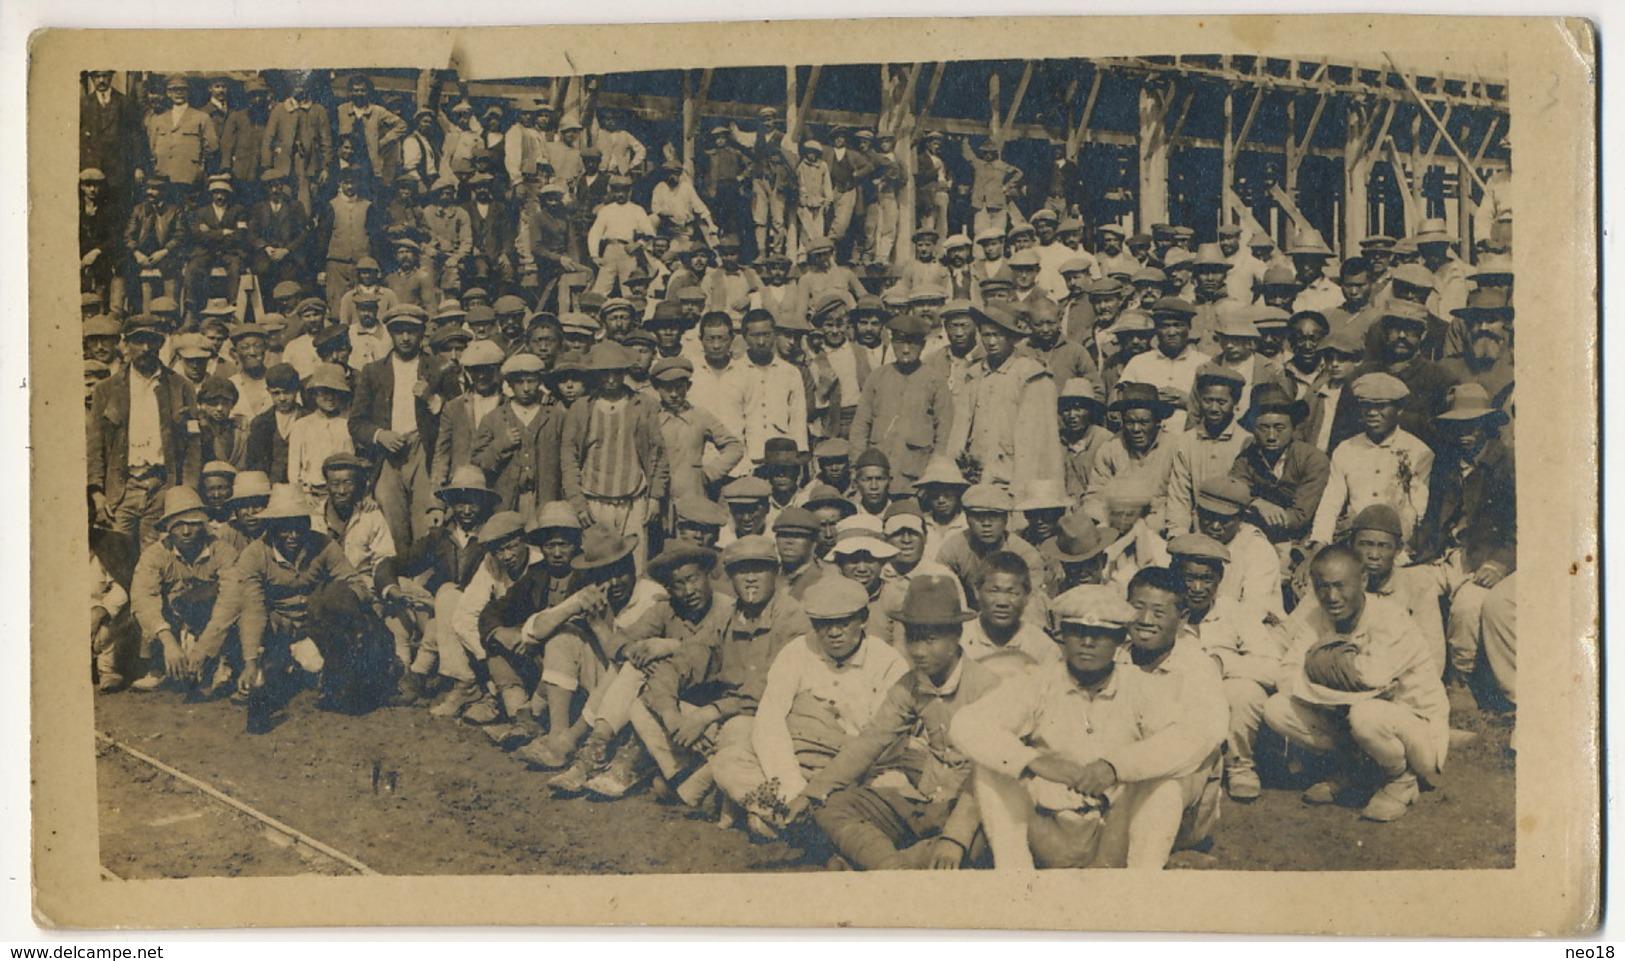 Carte Photo Mondeville Cormelles Caen Construction Pyrotechnie Par Chinois Sept 1917. Chinese Workers Building Factory - France